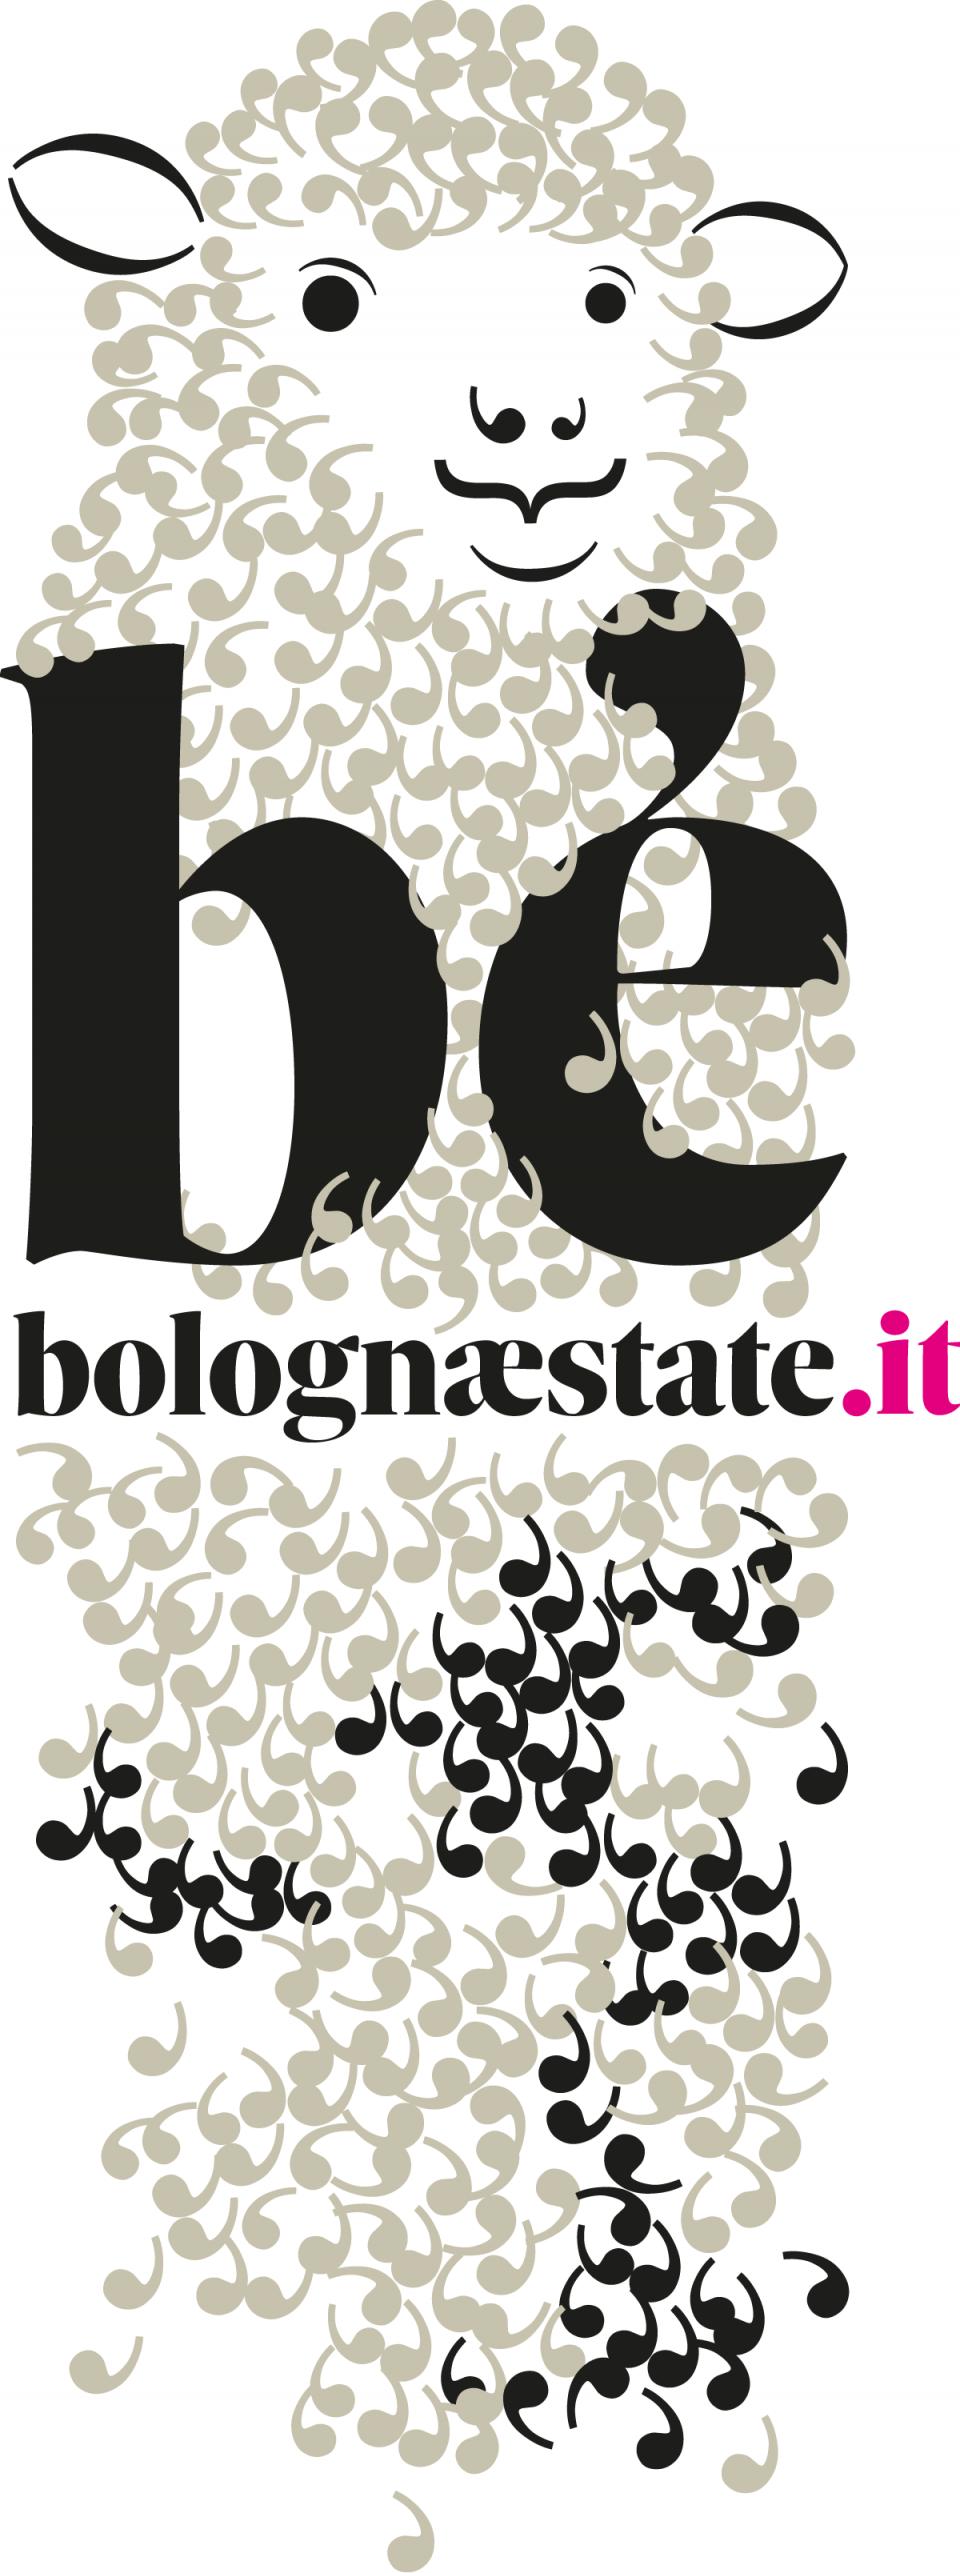 bolognaestate_logo2.png